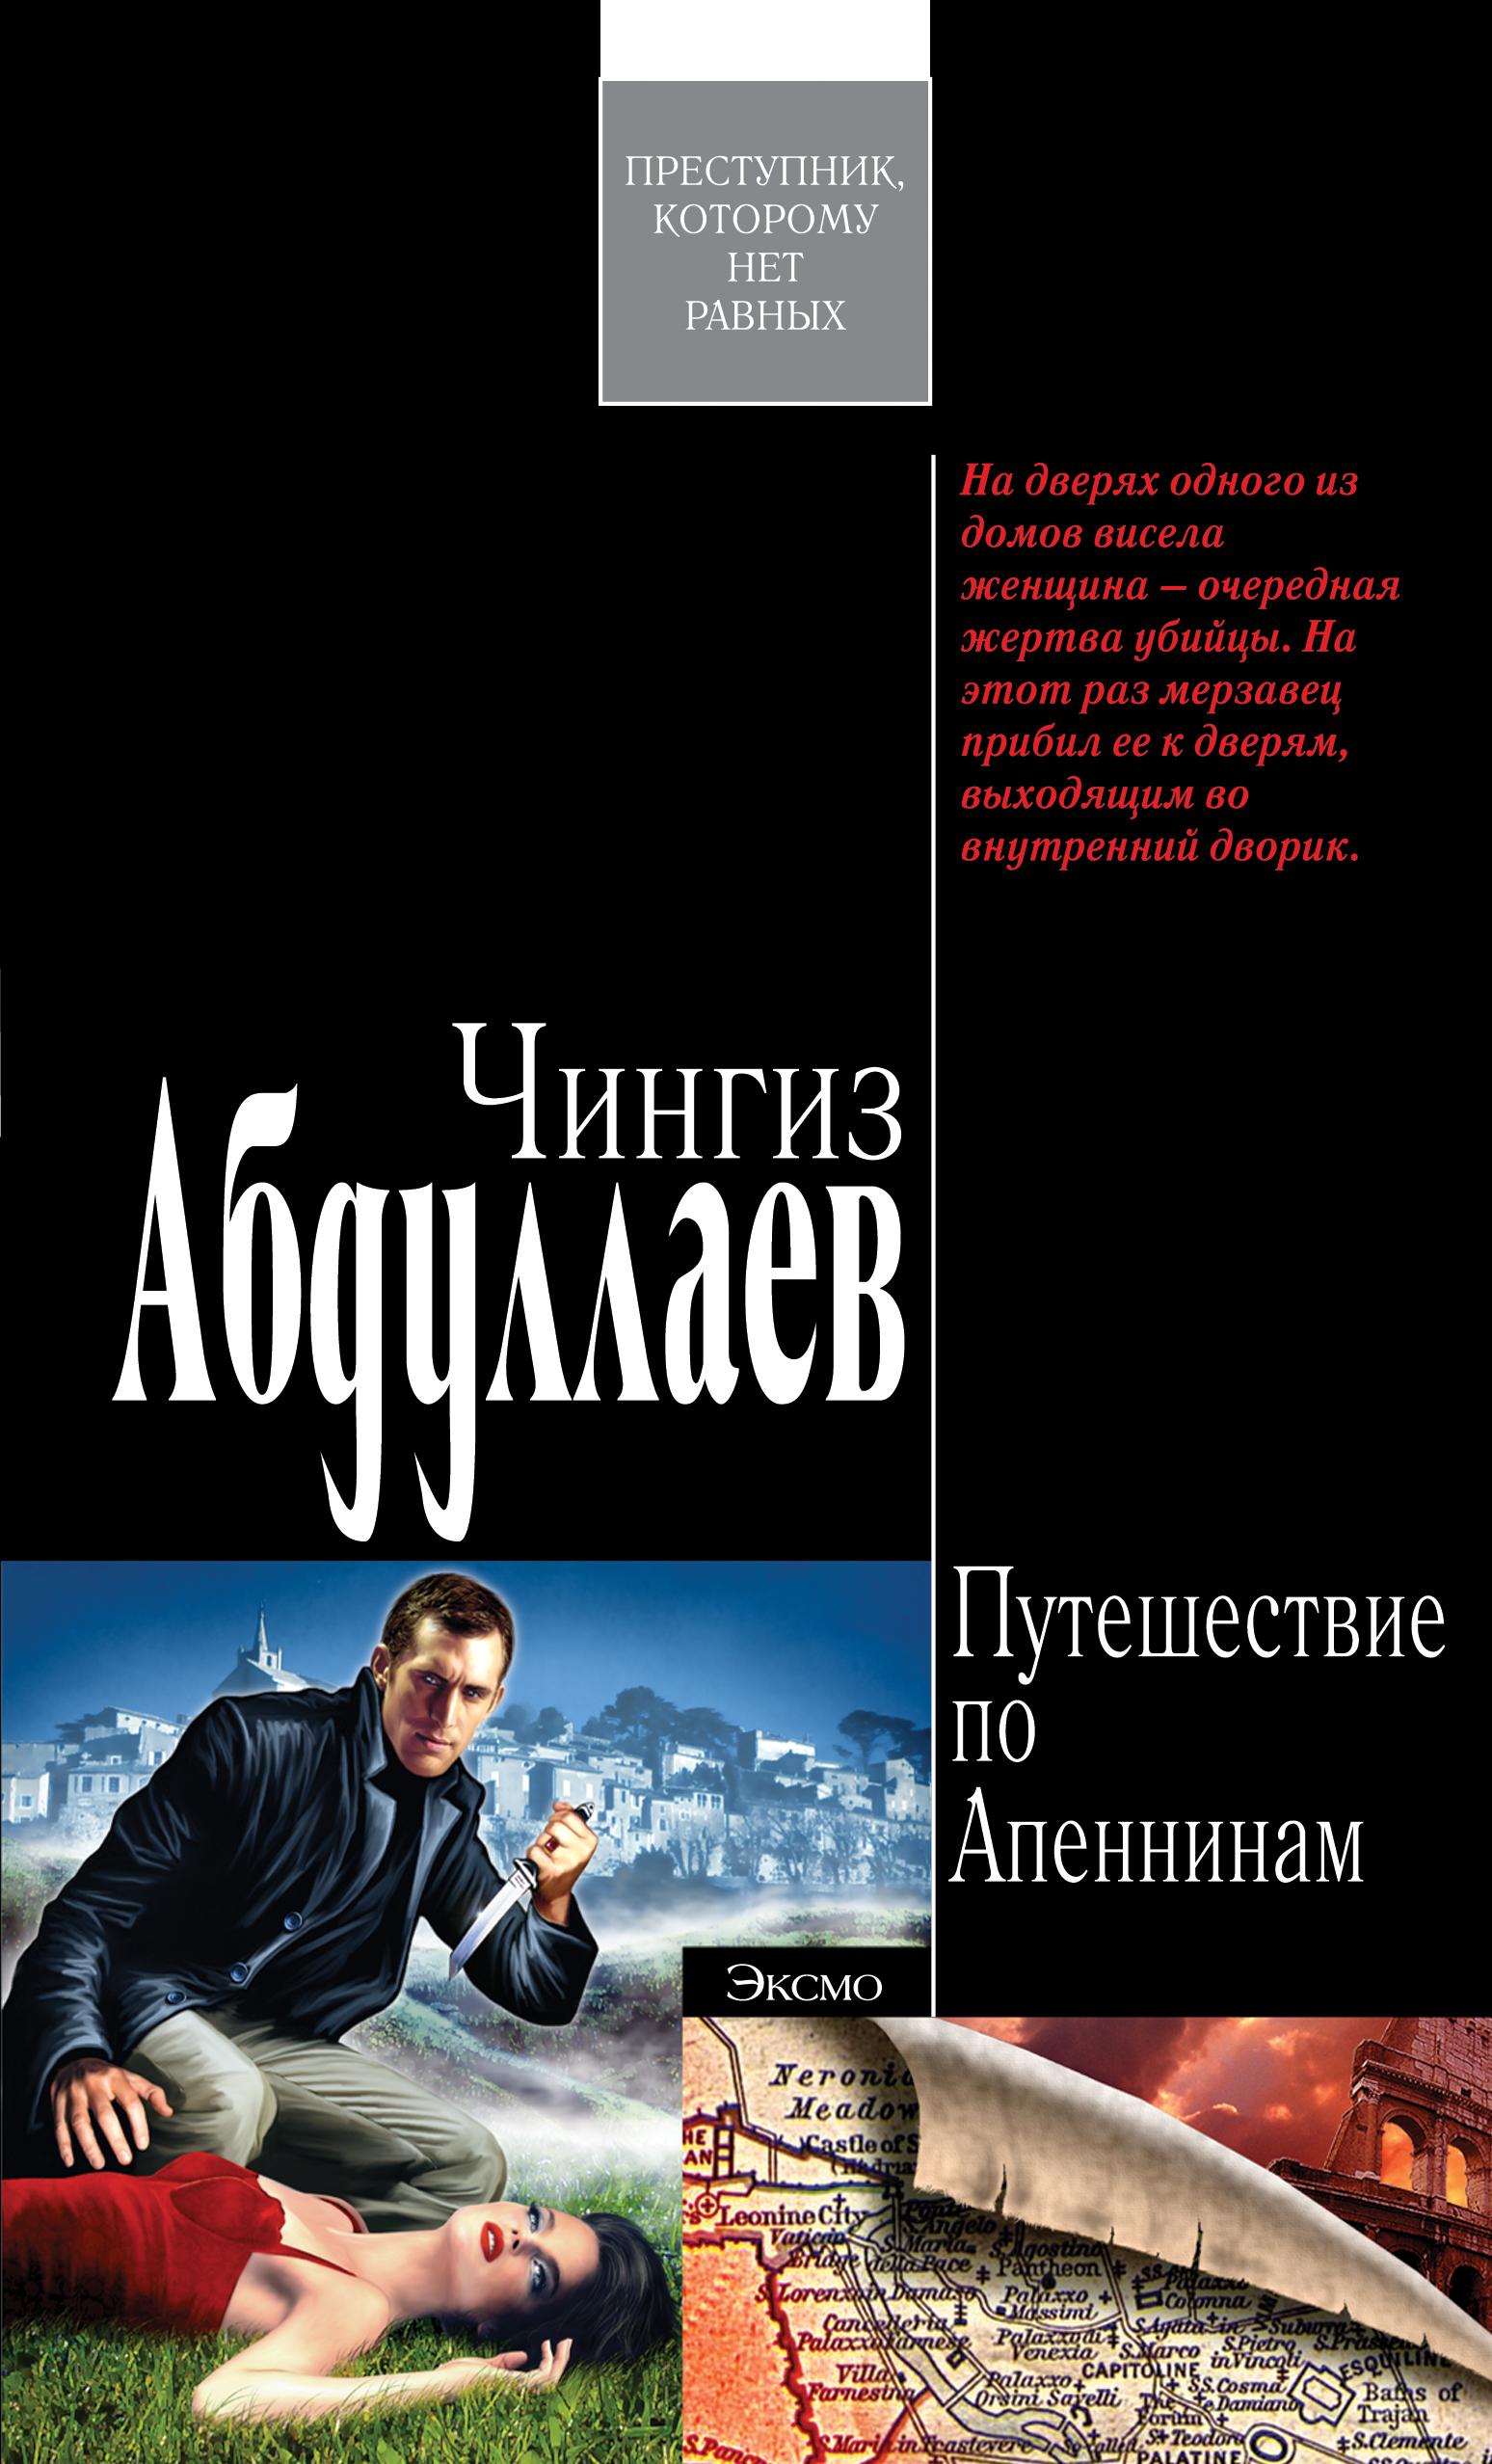 Чингиз Абдуллаев Ангел боли: Путешествие по Апеннинам